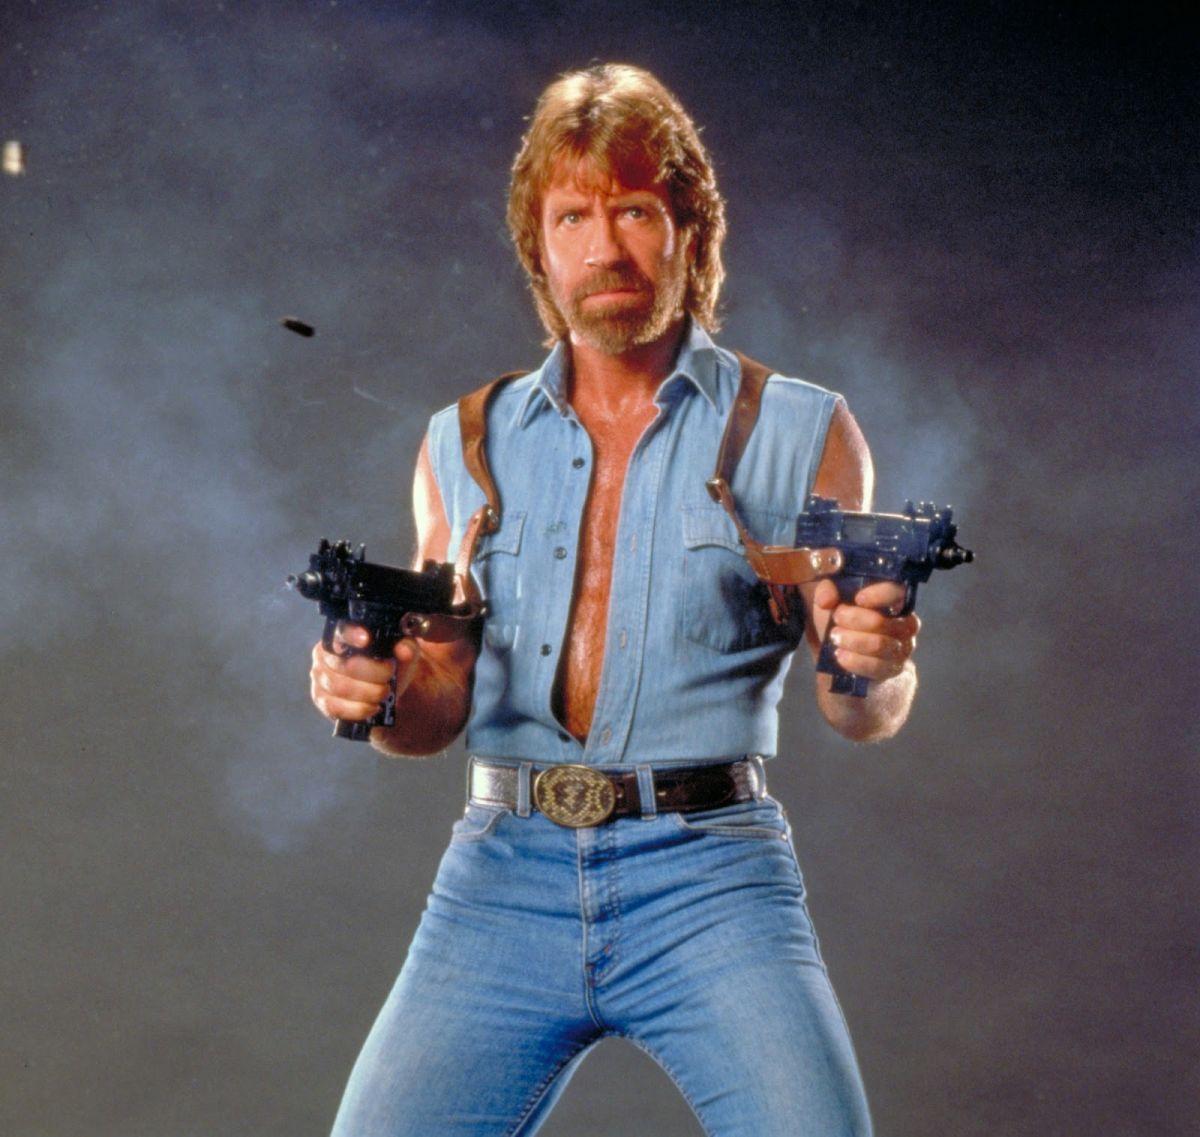 55b8fff68a817 Chuck Norris Guns Meme Generator - Imgflip